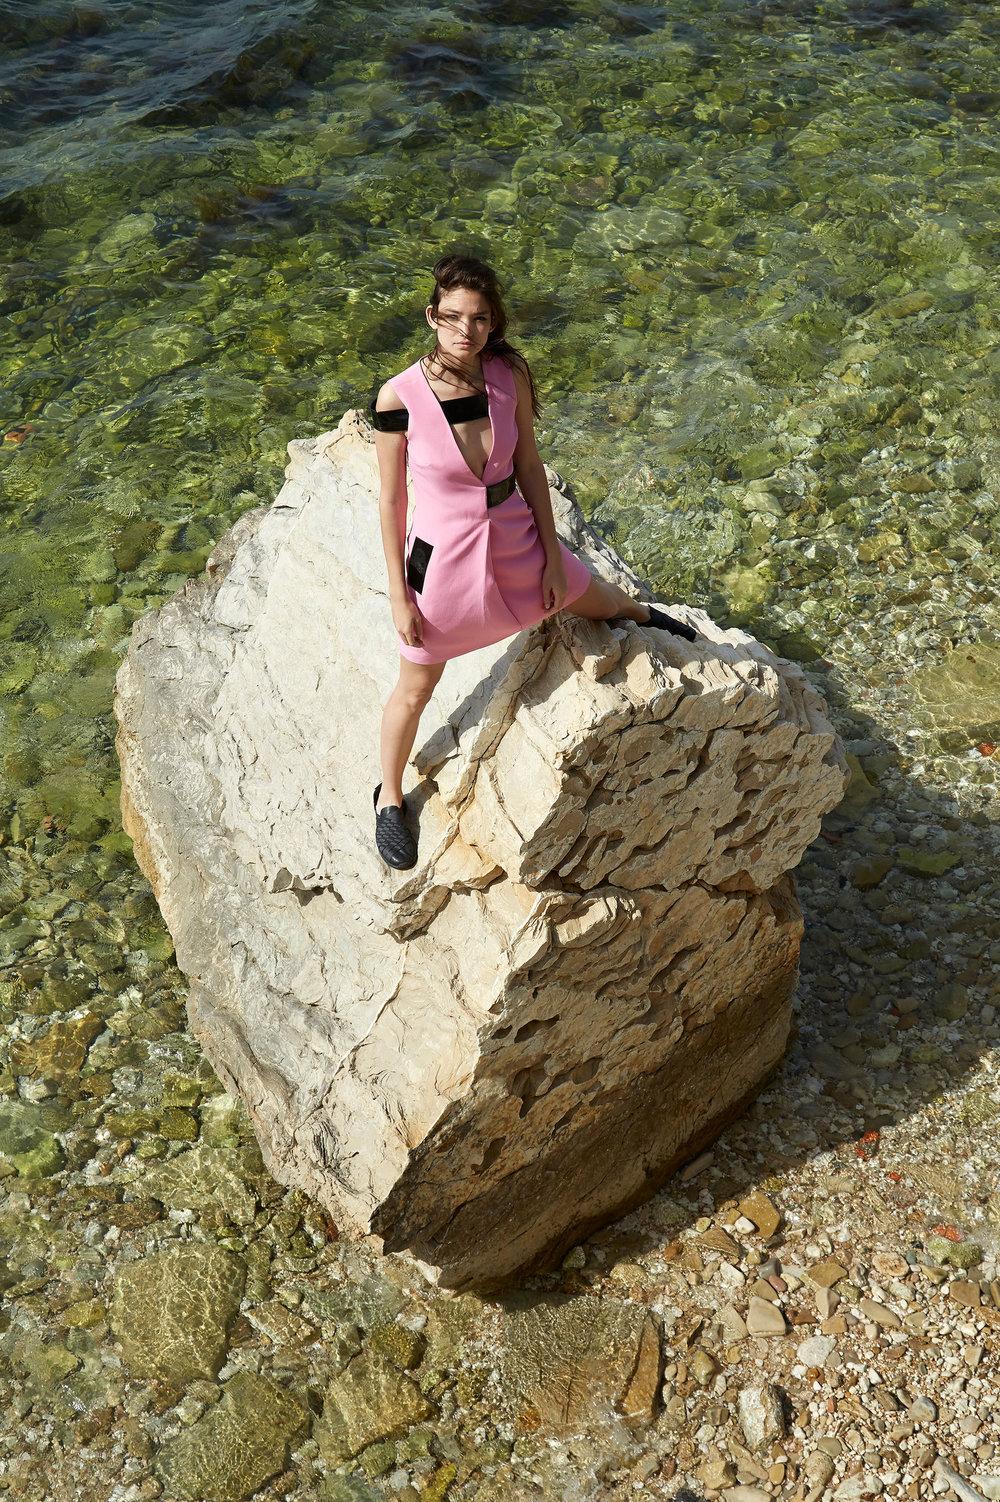 Pre-Fall Takes a Trip Down Croatia's Coastline